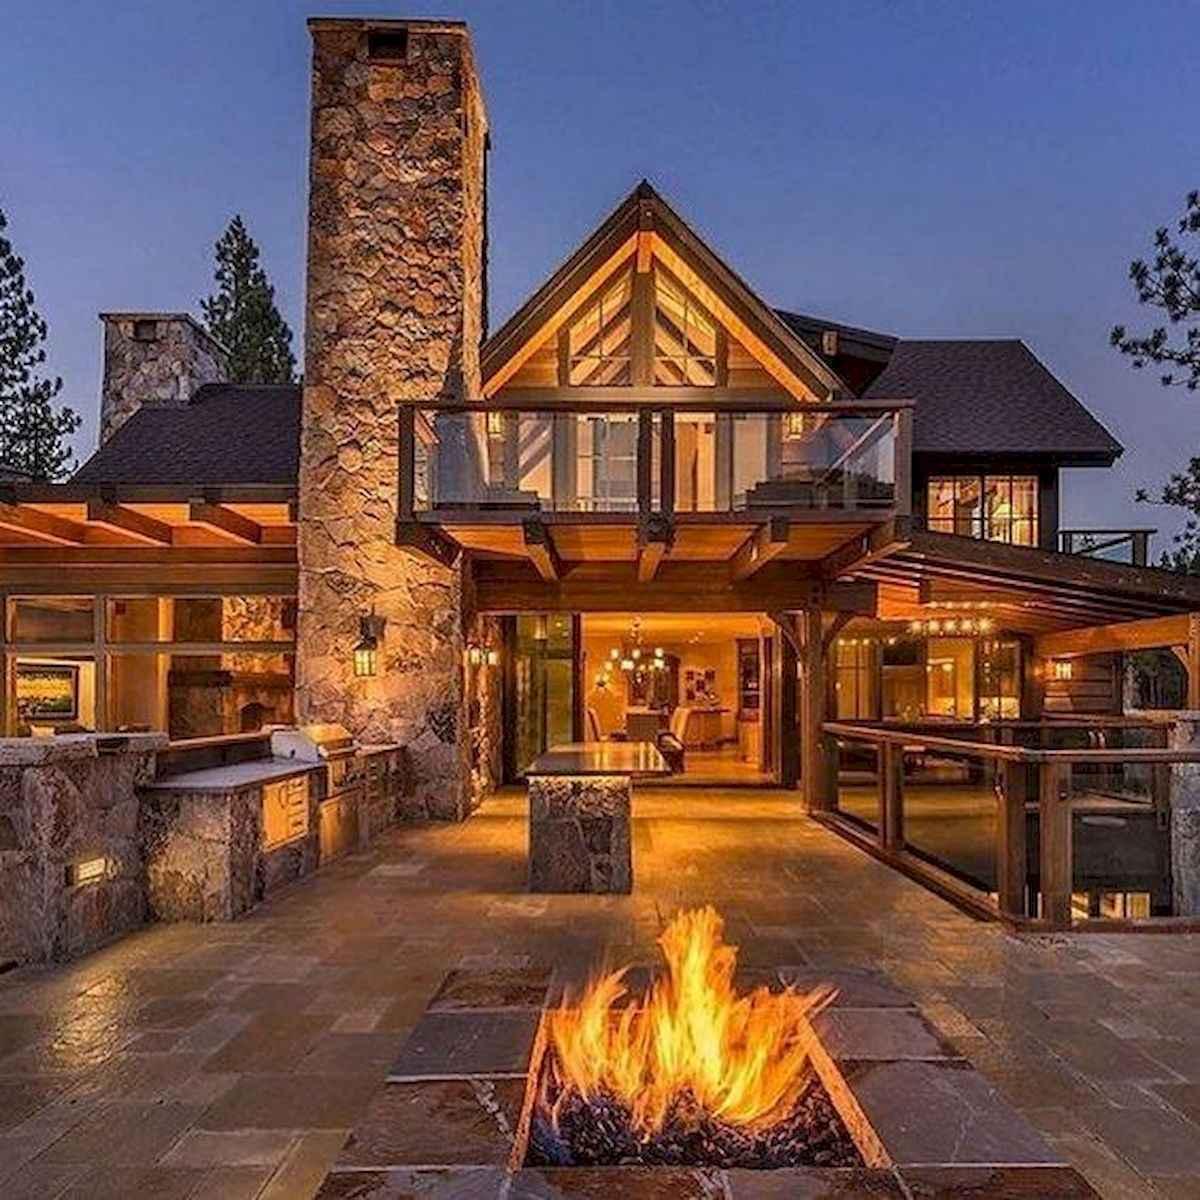 50 Best Log Cabin Homes Modern Design Ideas (37)